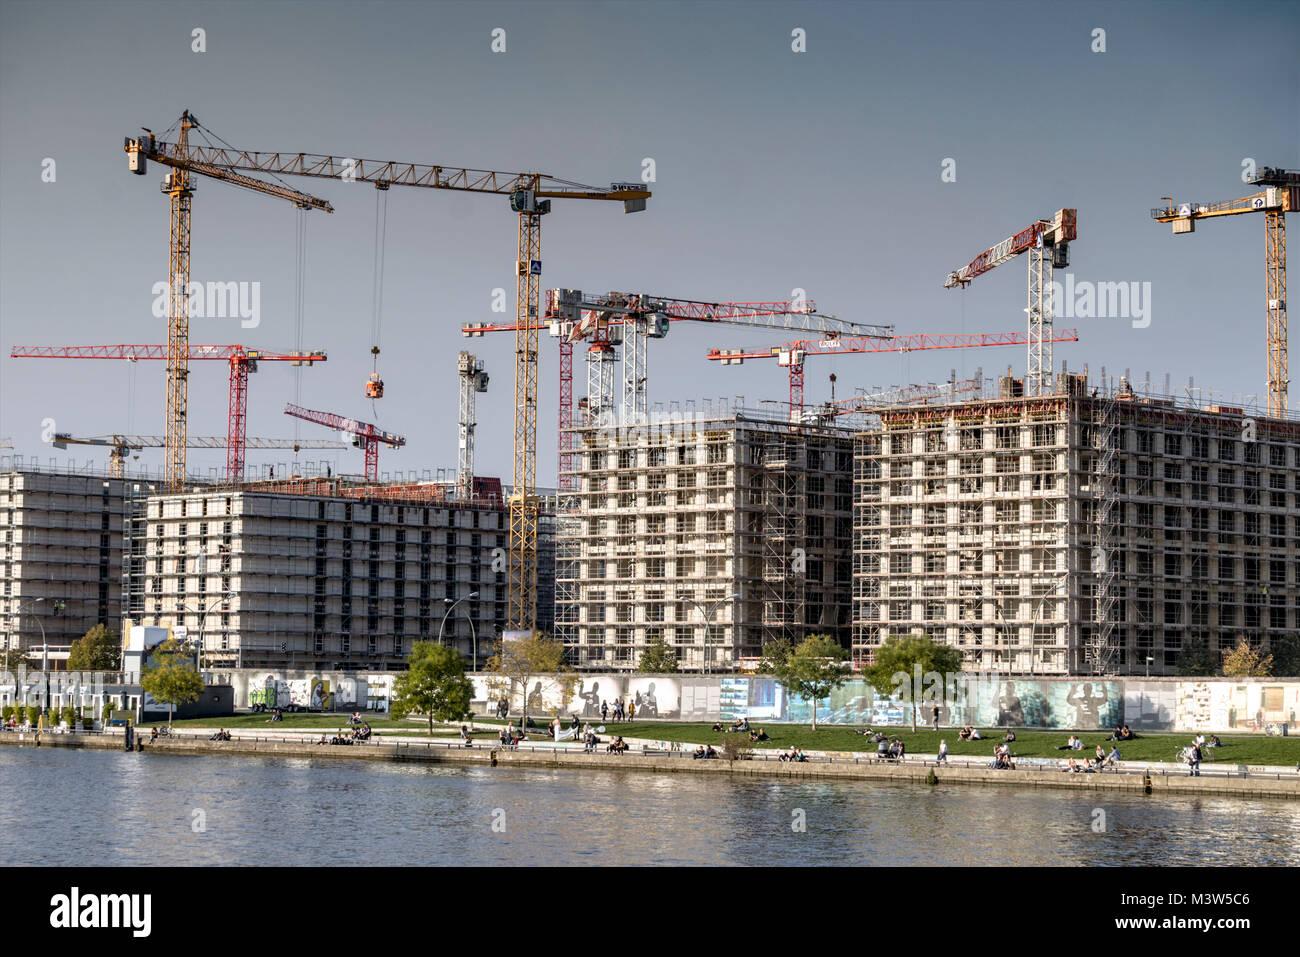 Contruction Media Spree, Hotel and Office Campus, East Side Gallery, Spree riverside, Friedrichshain, Berlin - Stock Image